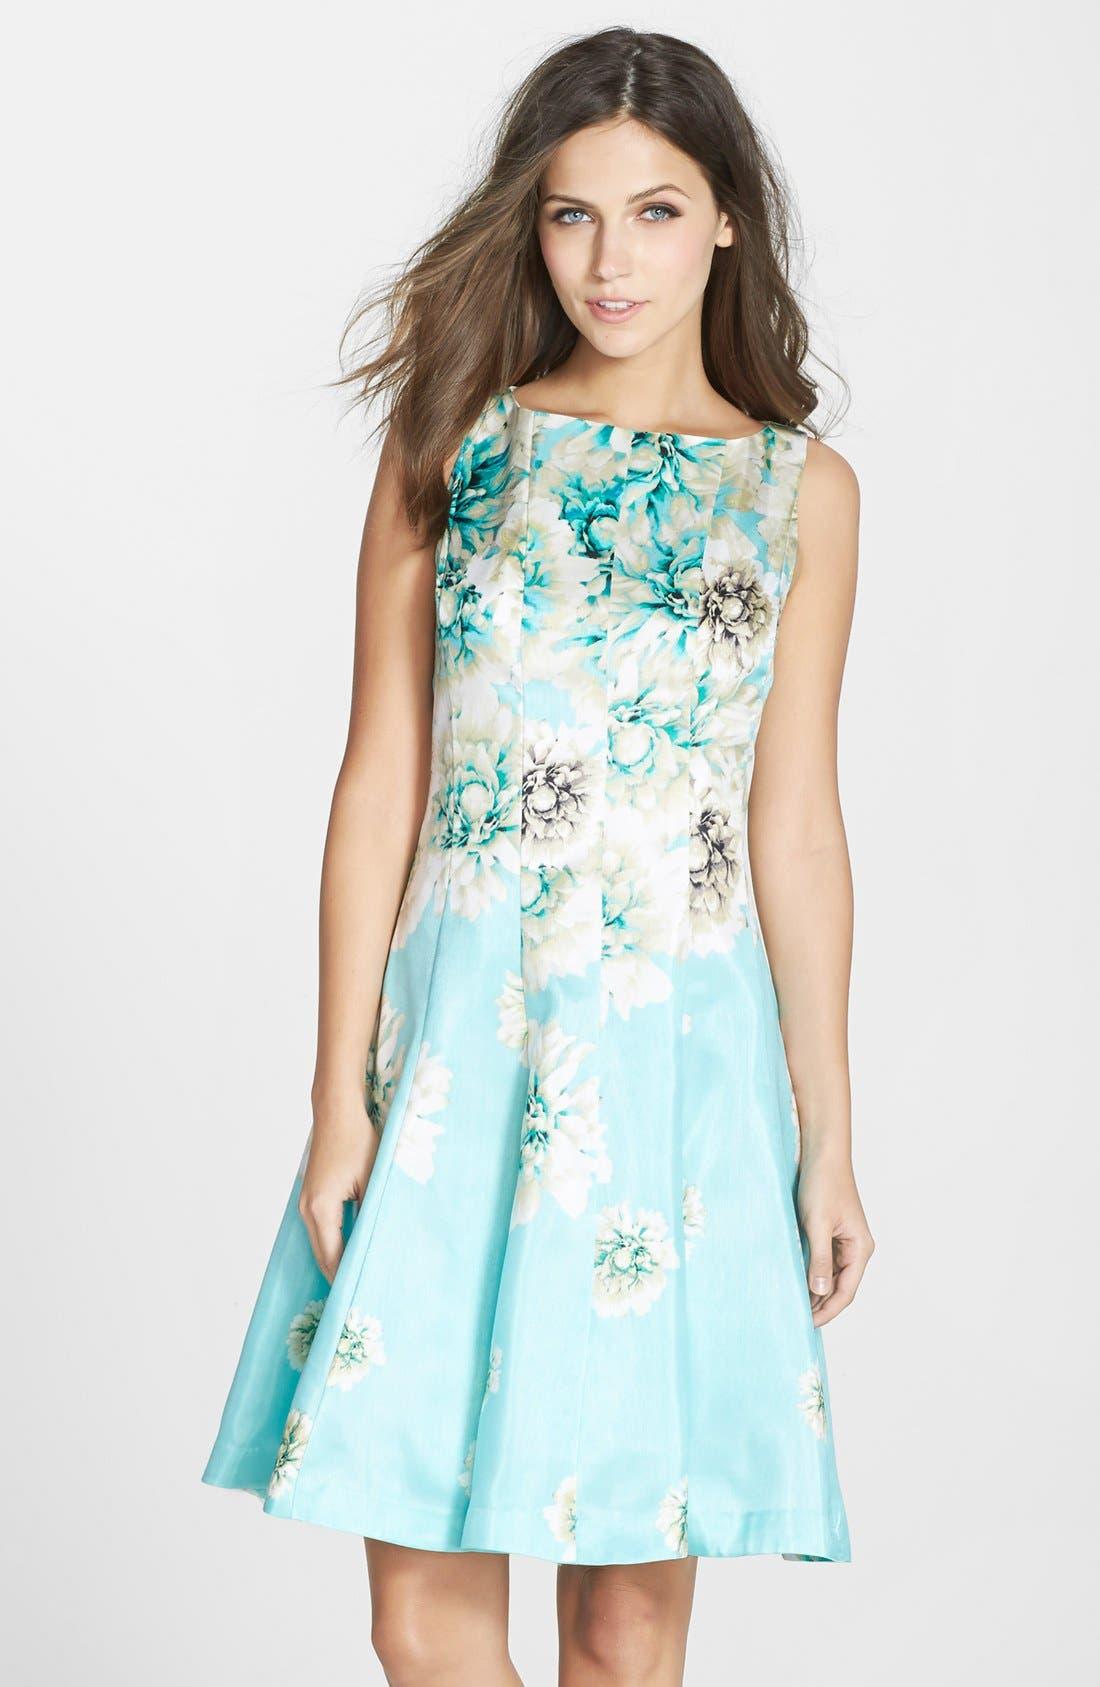 Alternate Image 1 Selected - Gabby Skye Floral Print Shantung Fit & Flare Dress